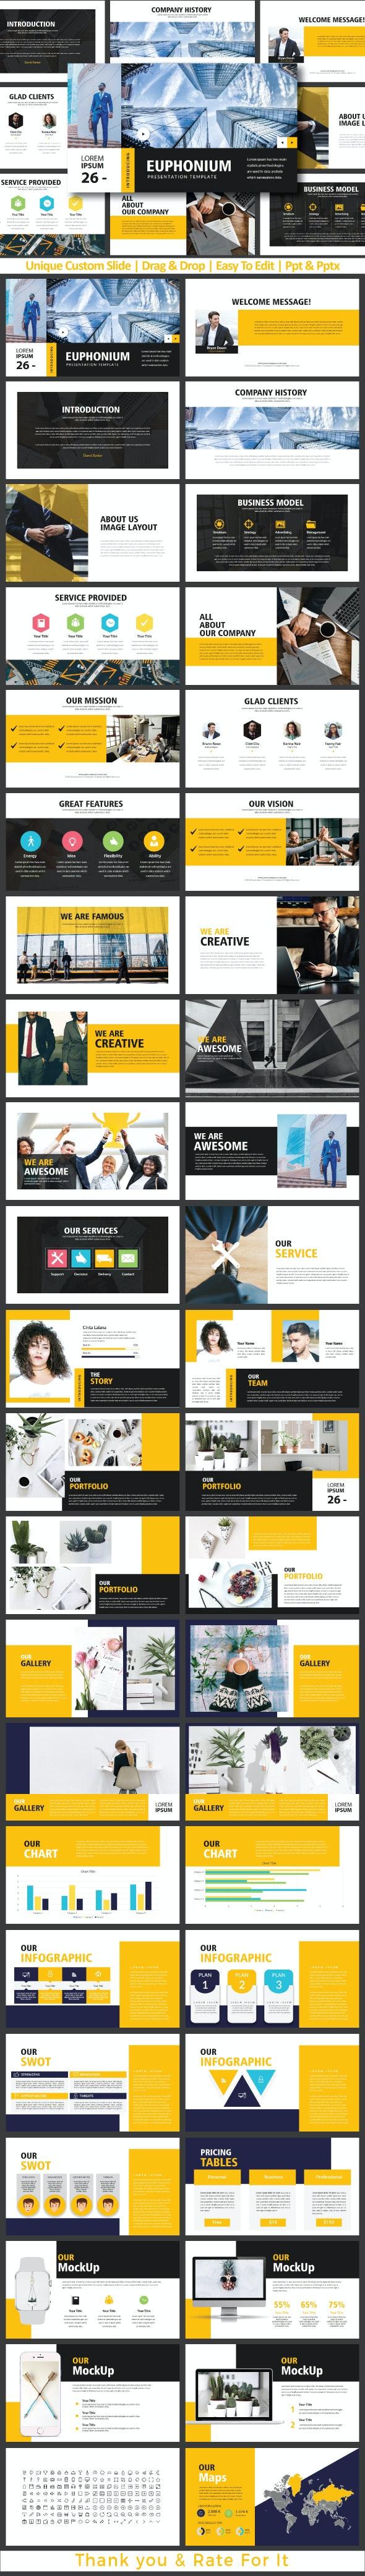 Euphonium Presentation Templates - Creative PowerPoint Templates